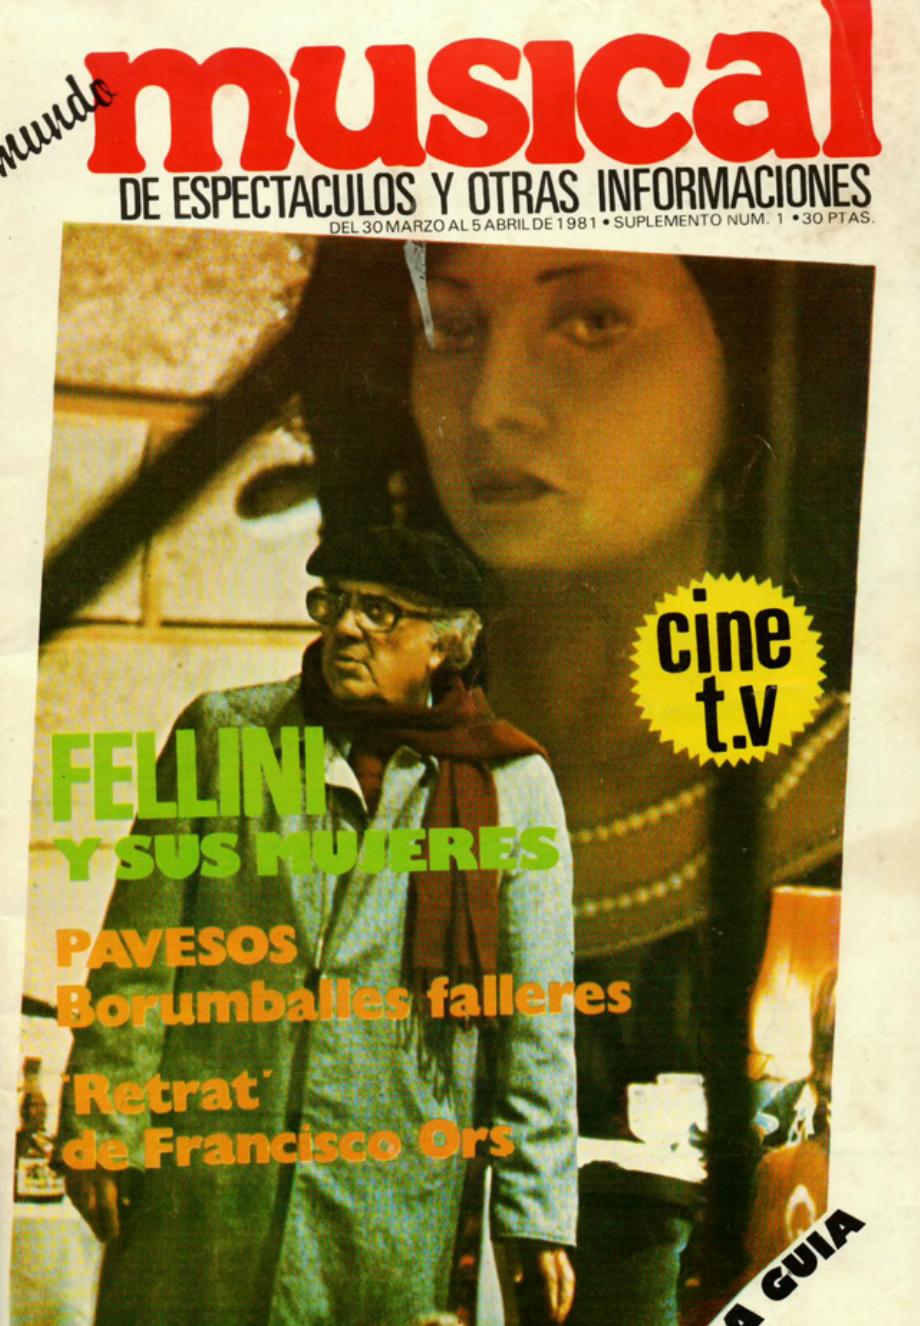 1981 Pavesos Borrumballes Falleres Musical 30 març